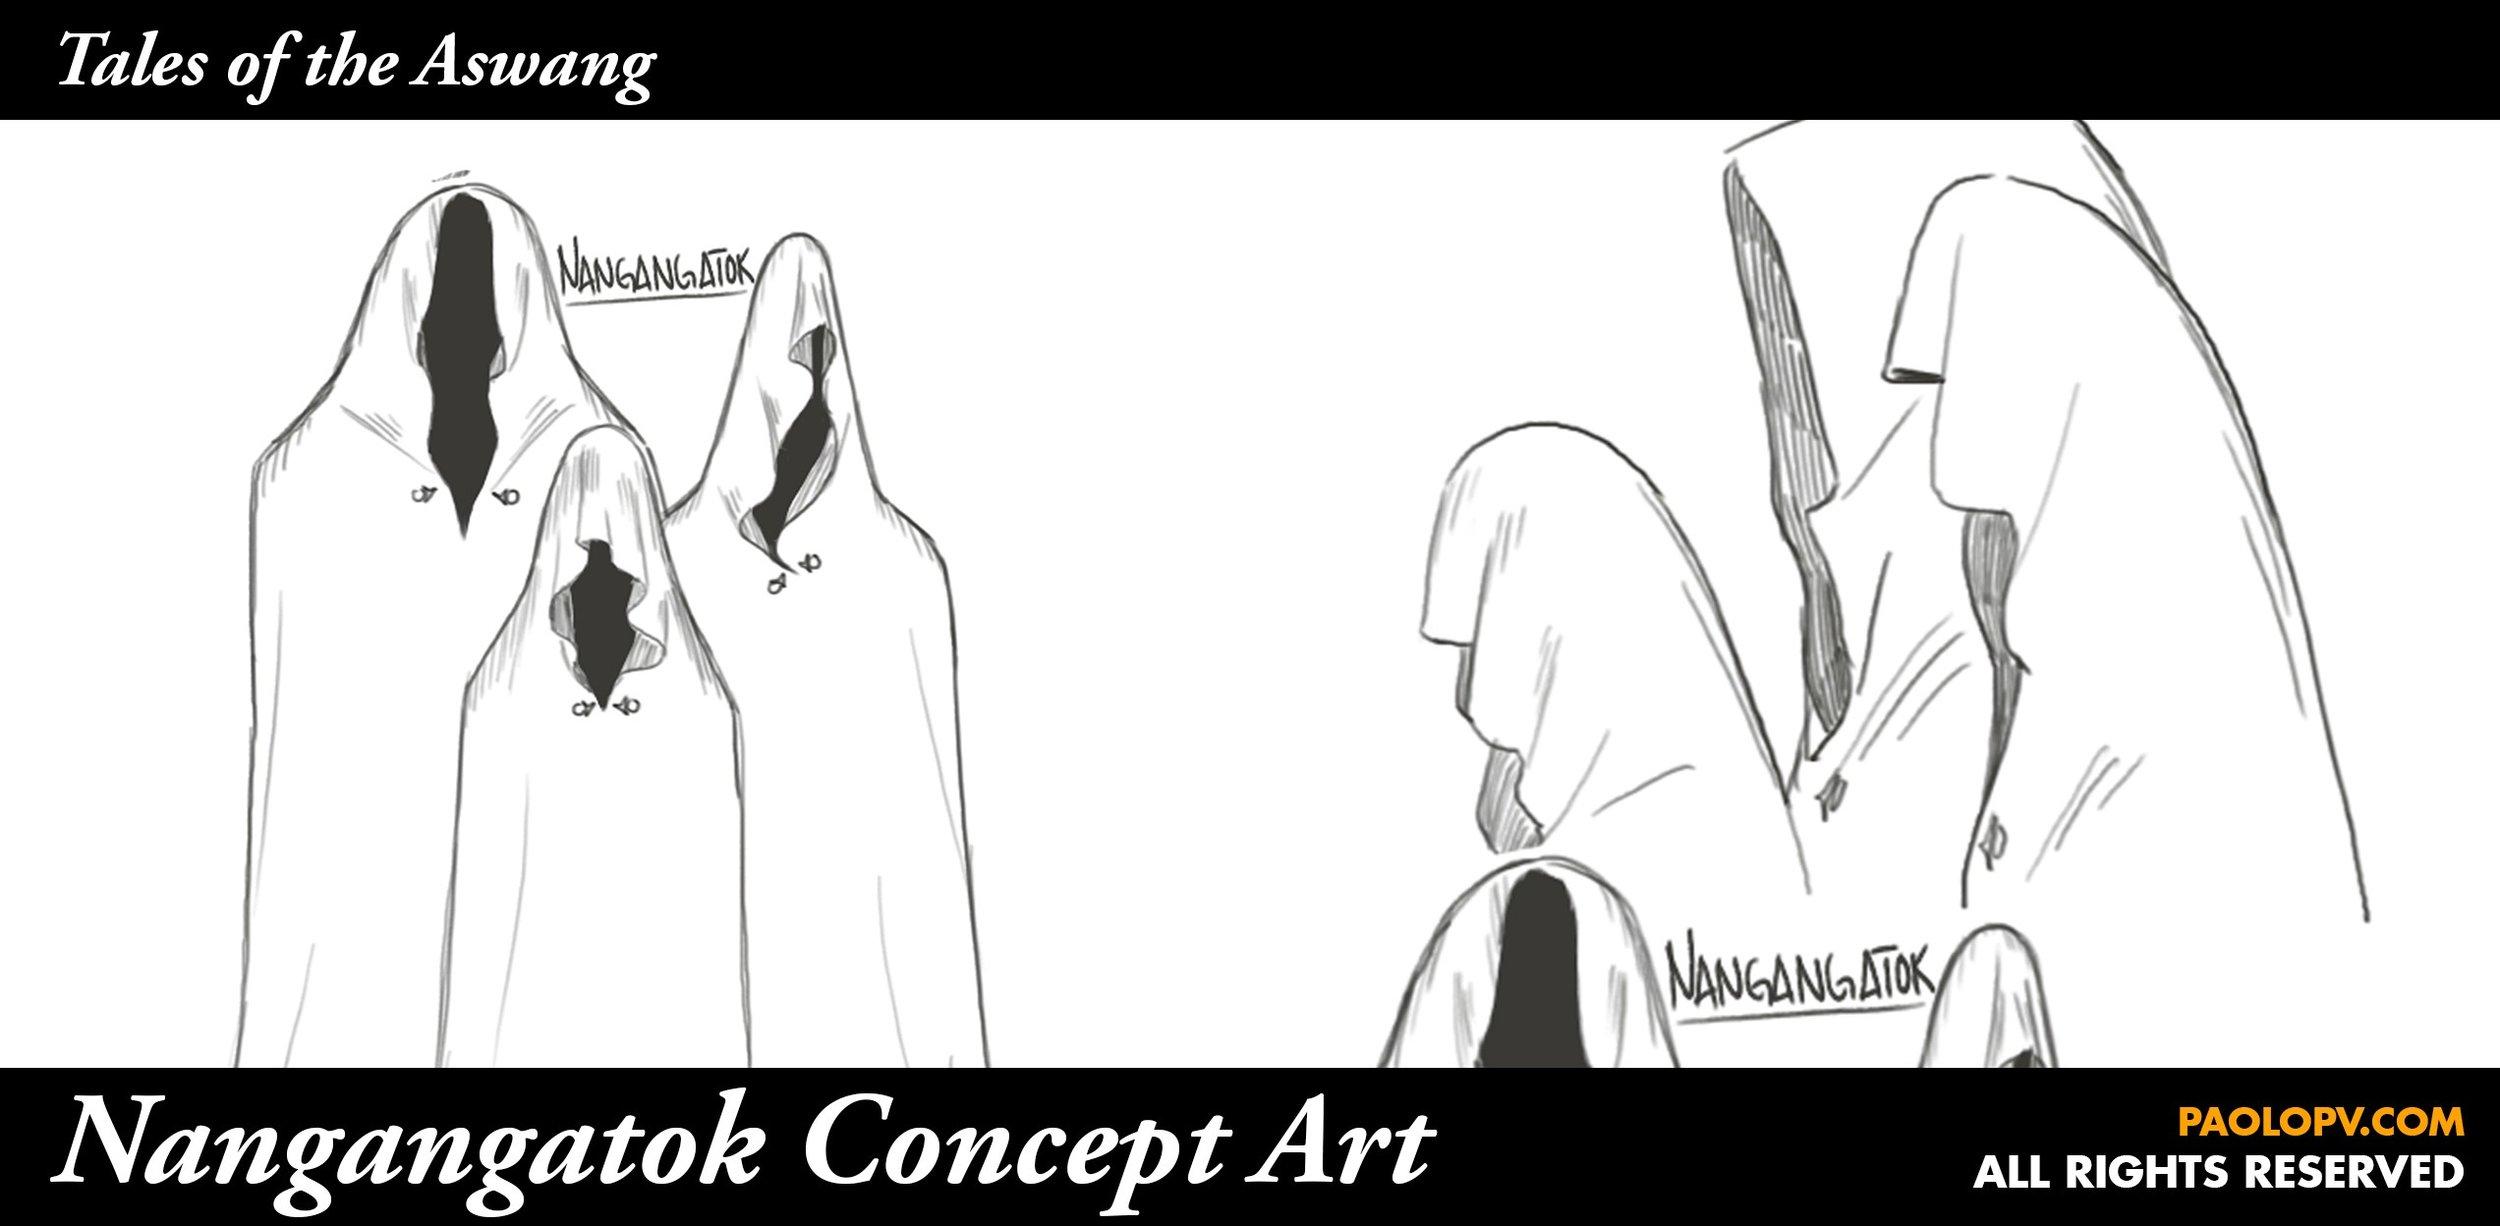 Tales-of-the-Aswang-Concept-Art-Nangangatok.jpg